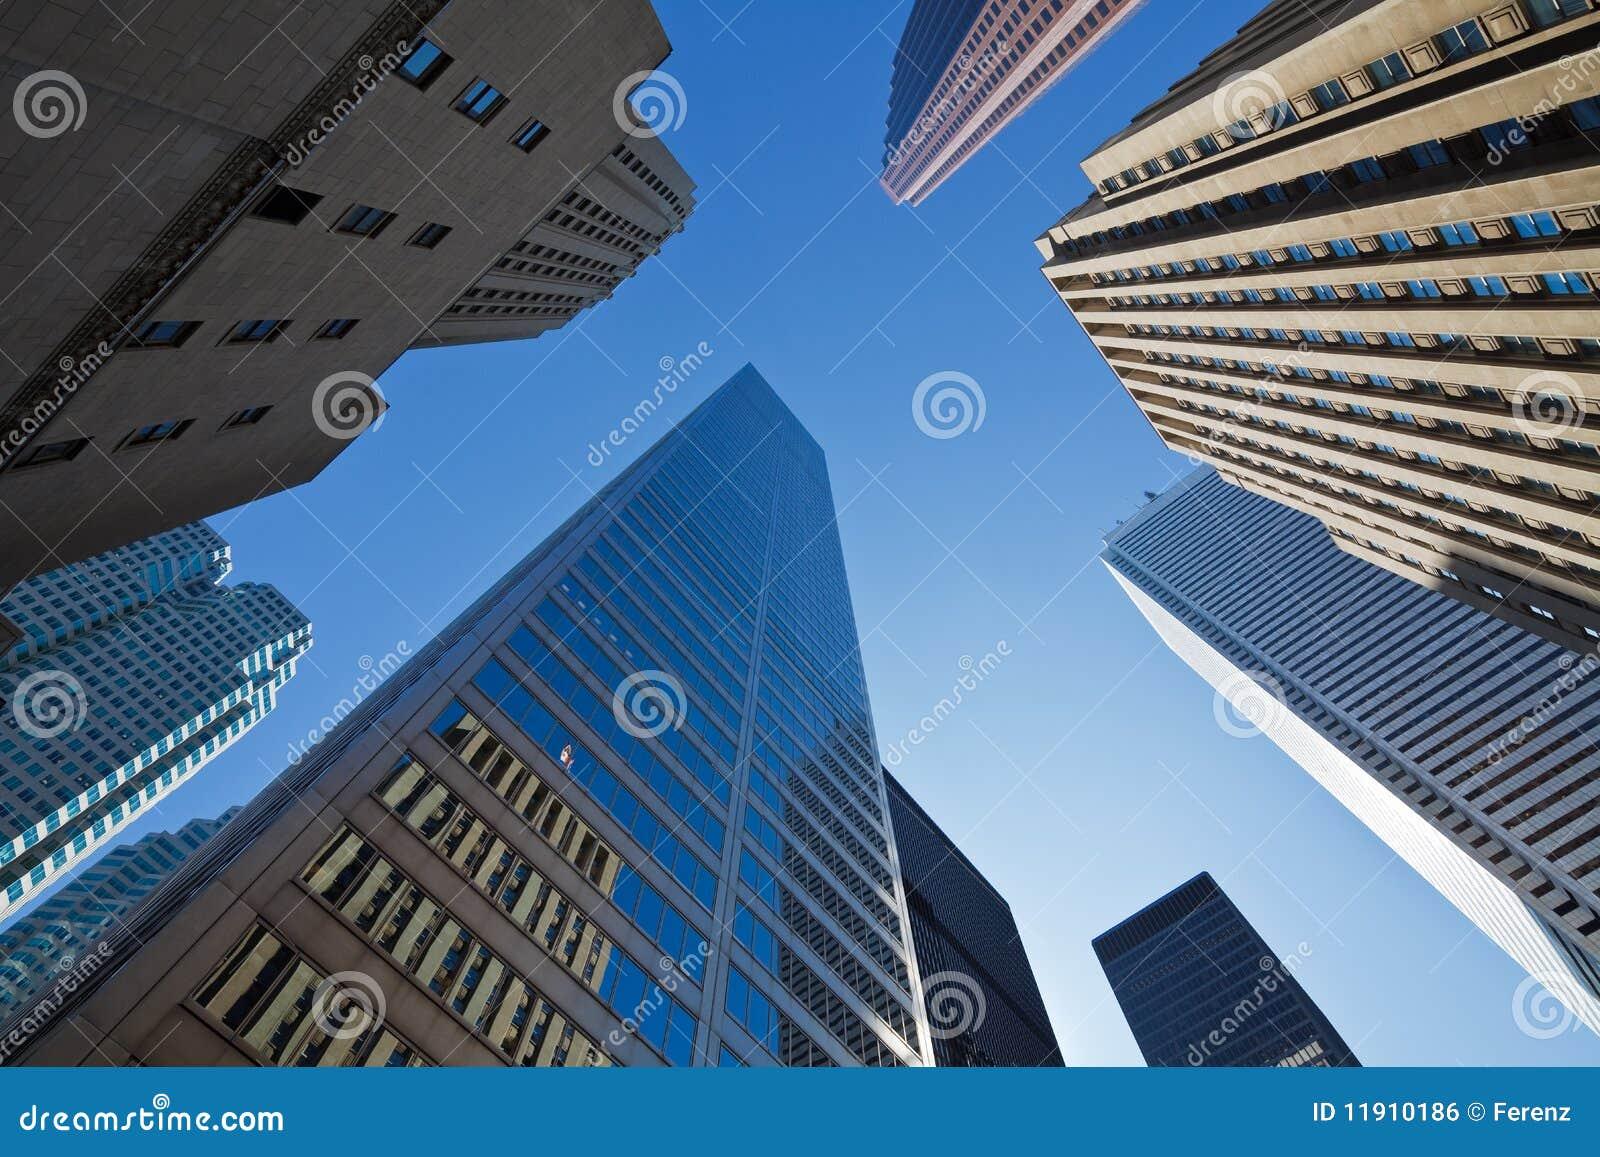 Toronto Skyscrapers Royalty Free Stock Image Image 11910186